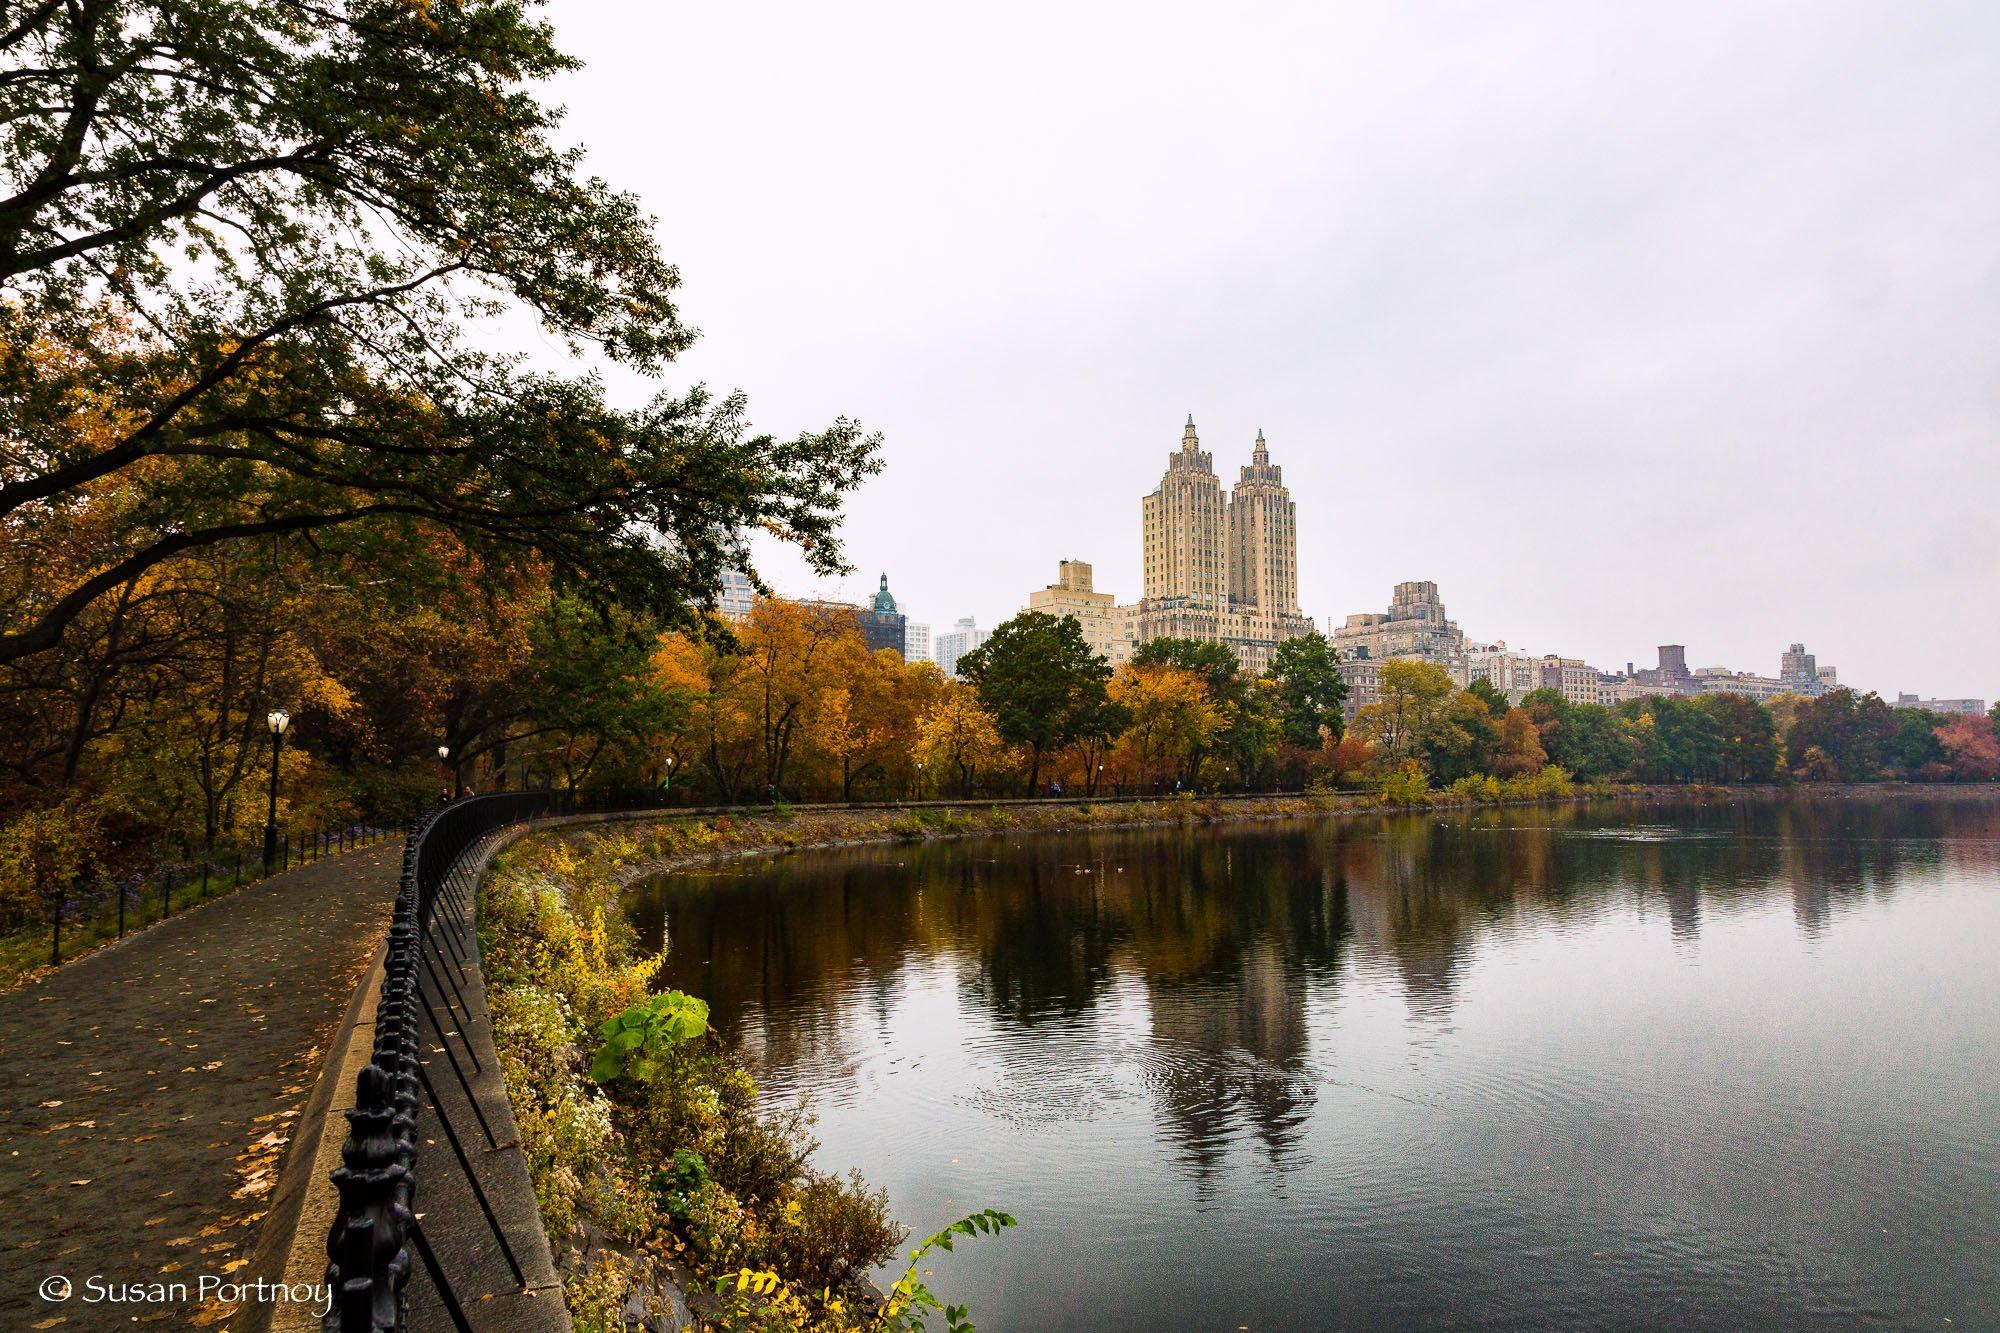 The Reservoir, in Central Park, New York